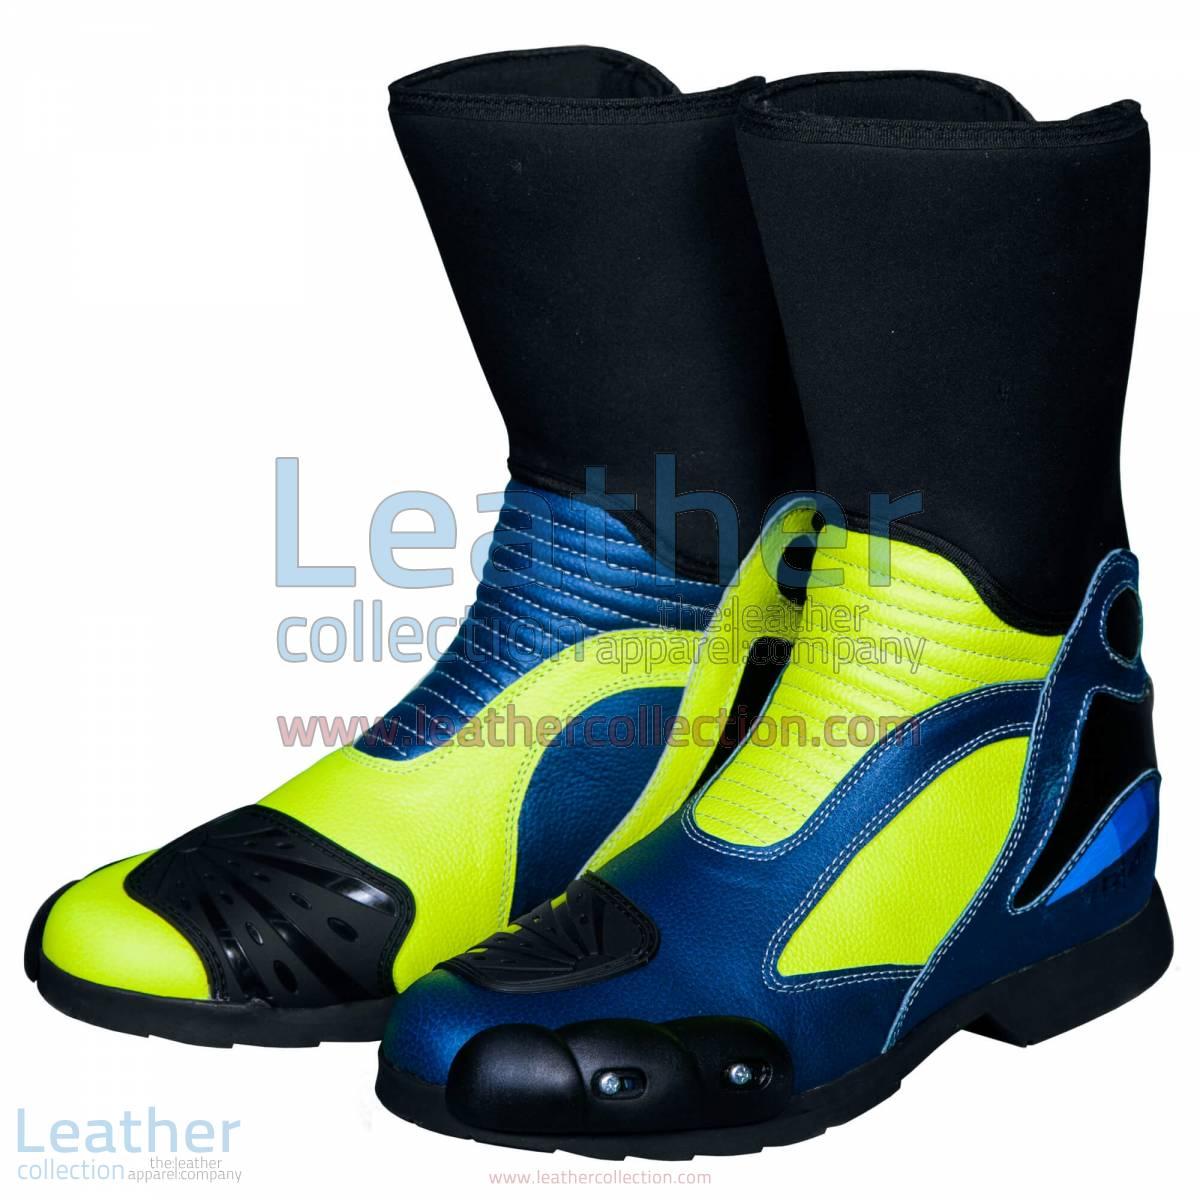 Valentino Rossi MotoGP 2016 & 2017 Race Boots   Valentino Rossi MotoGP 2016 & 2017 Race Boots